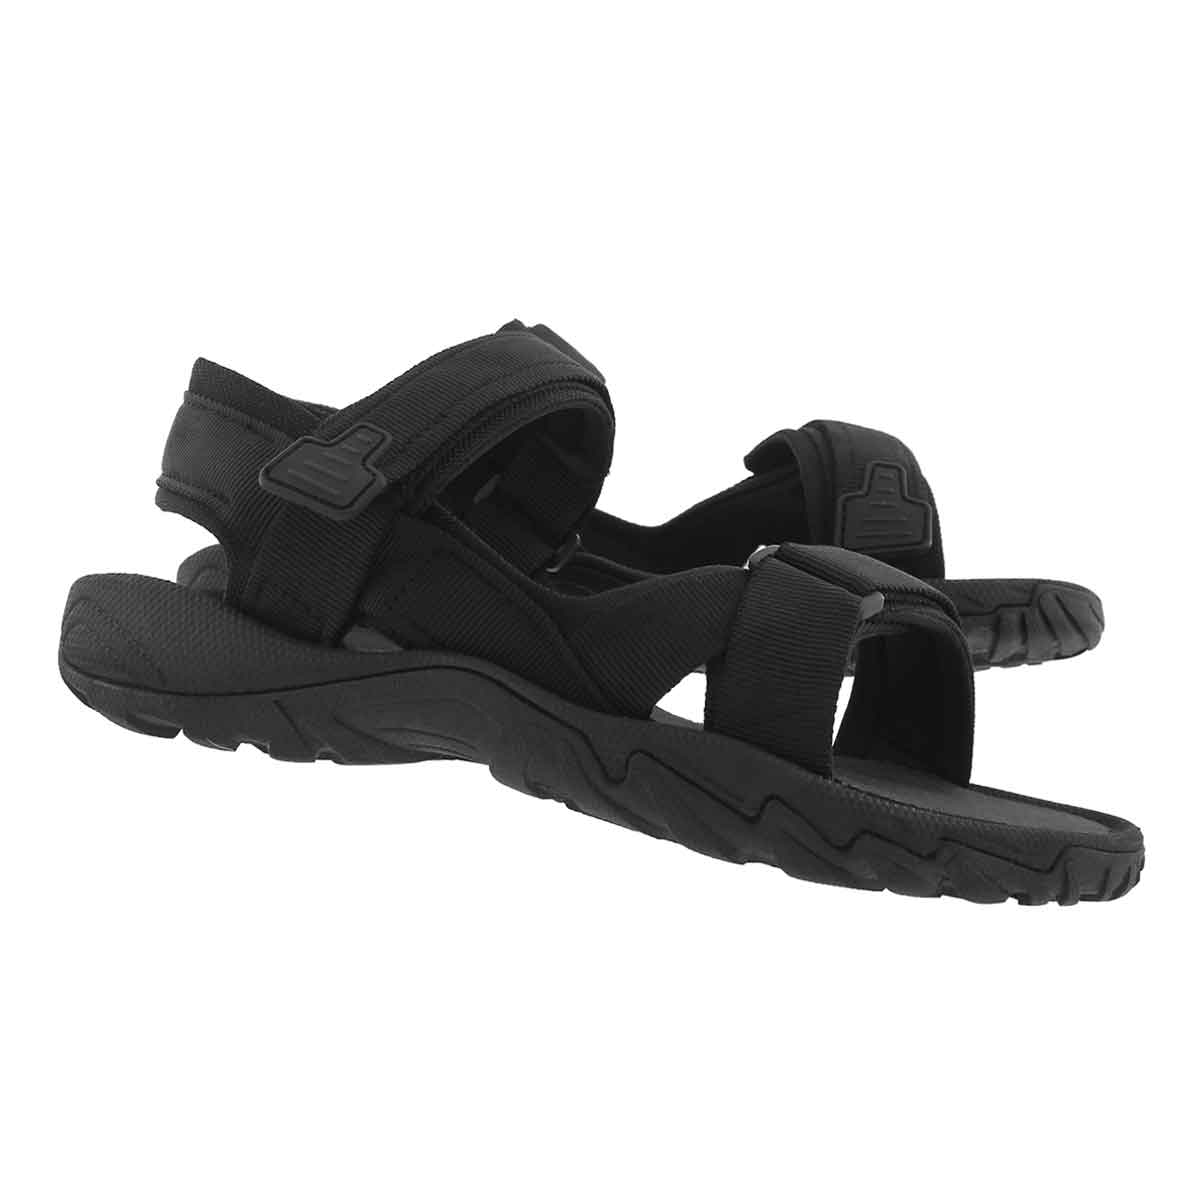 Mns Liam black 3 strap sport sandal